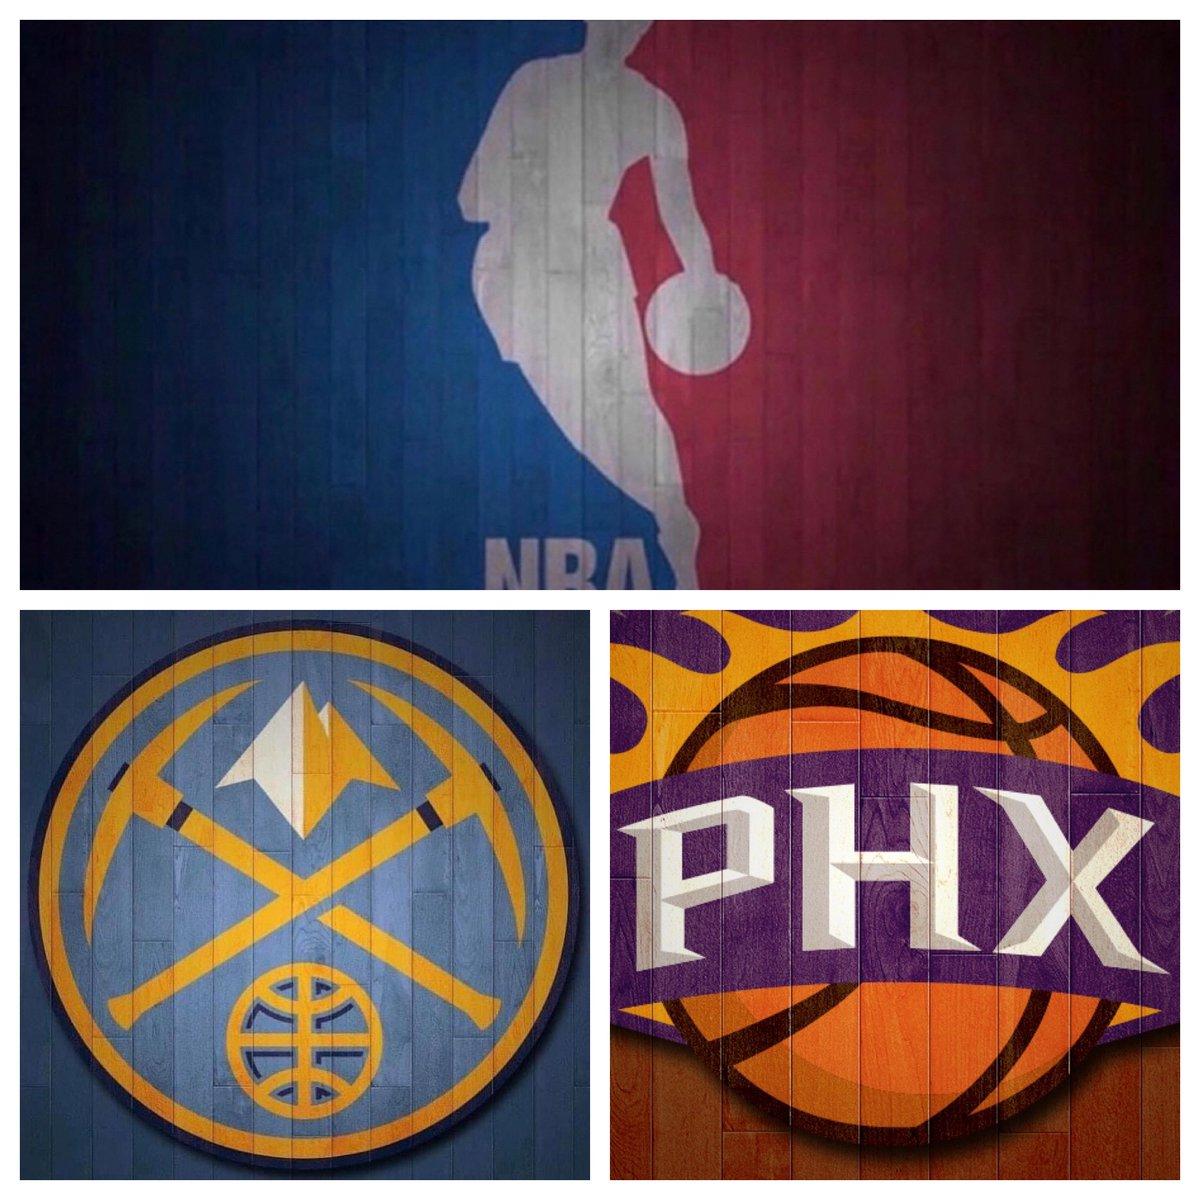 #IESRSN #Nuggets @ #Suns is underway! #NBA #DENvsPHX #MileHighBasketball #WeAreTheValley